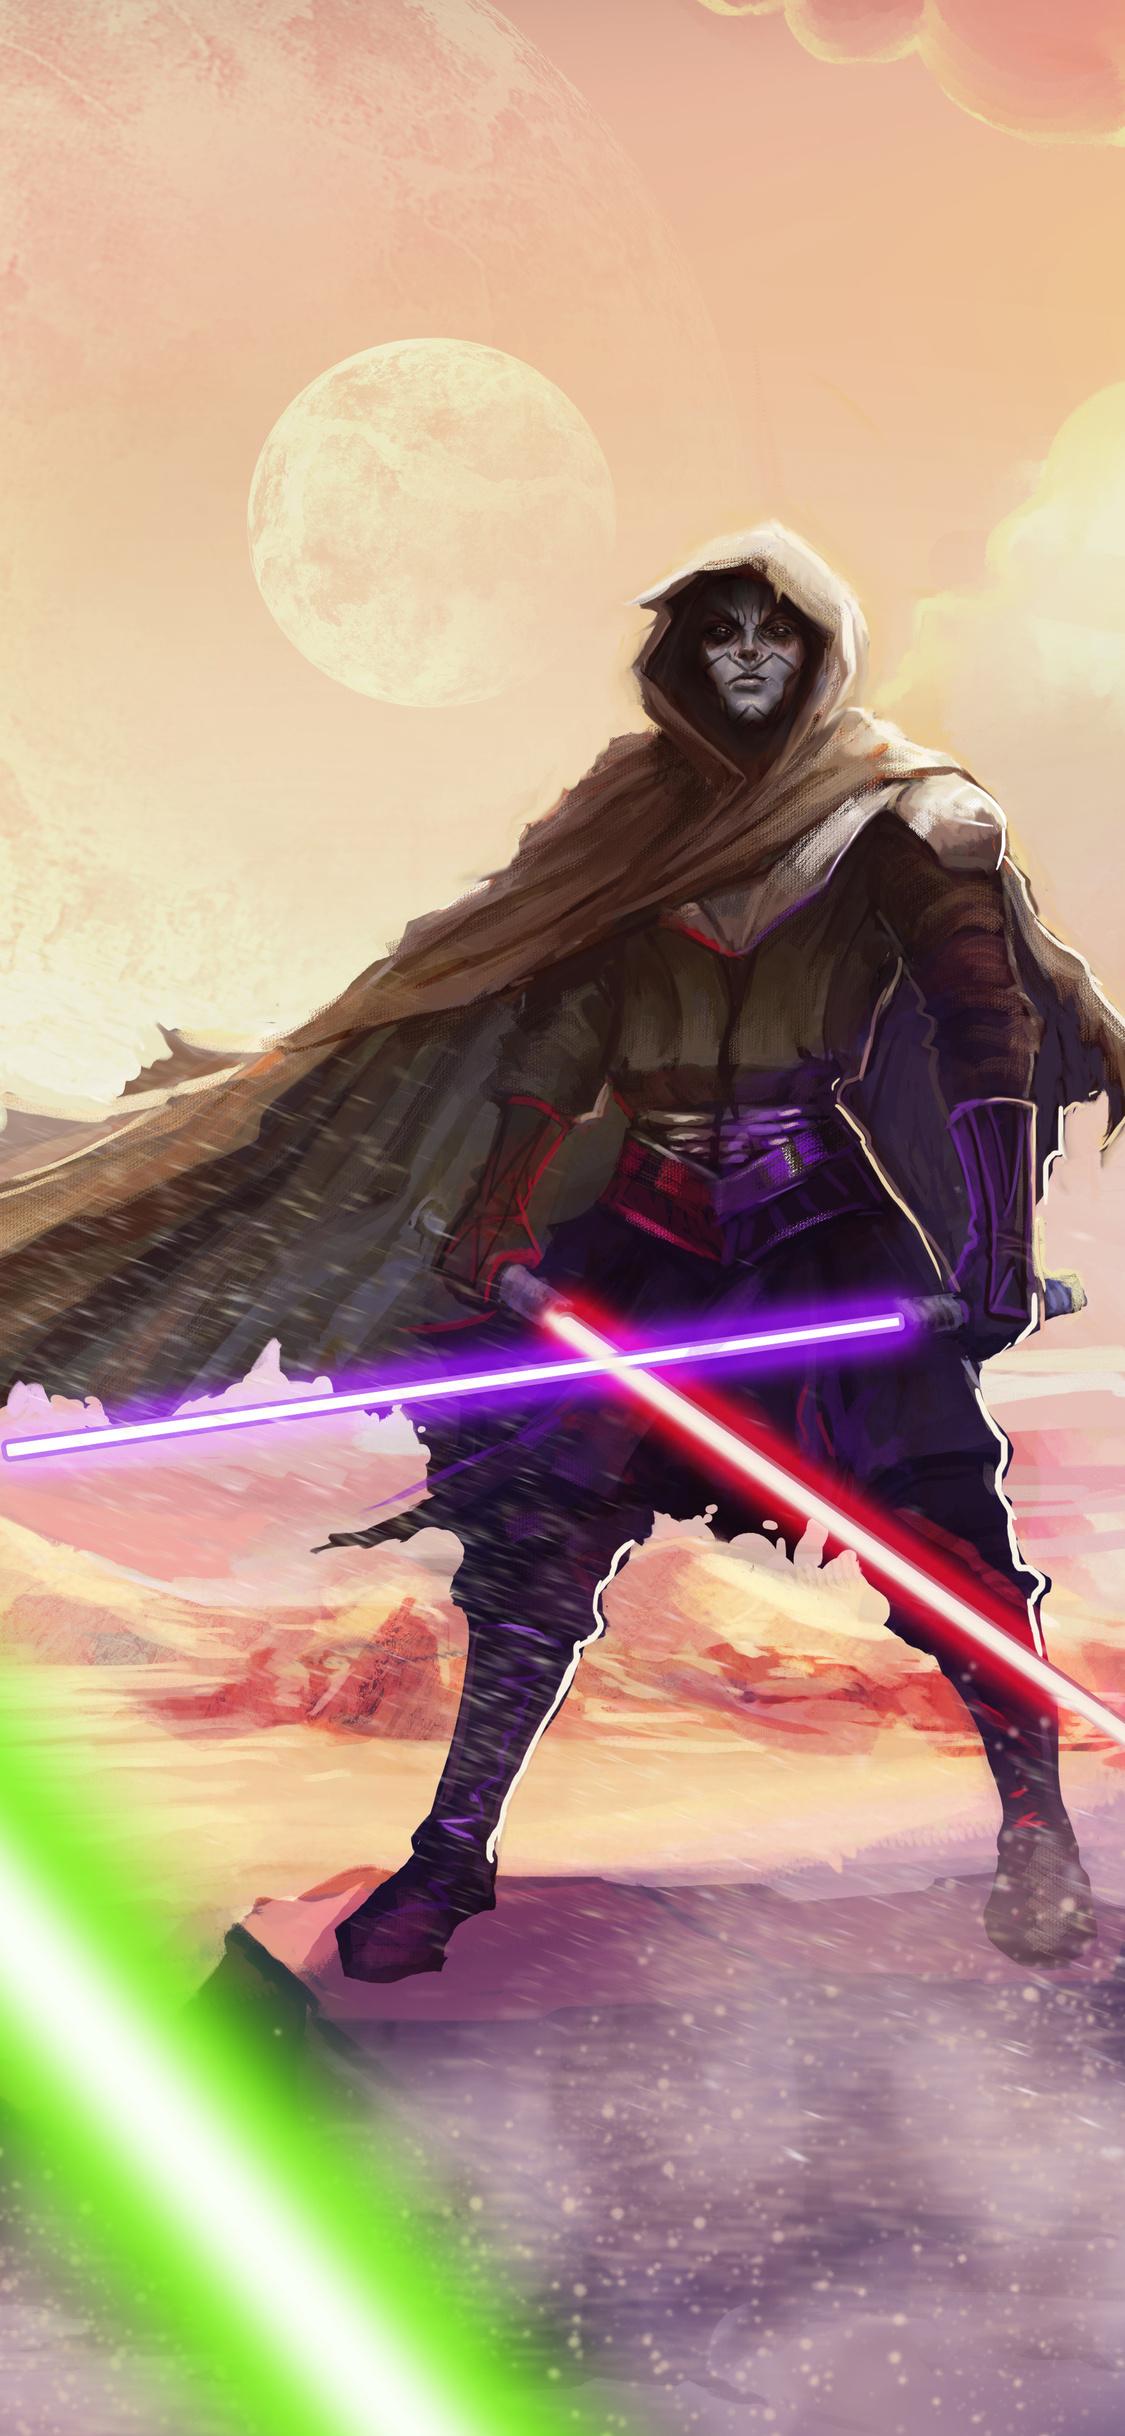 sith lord star wars zo